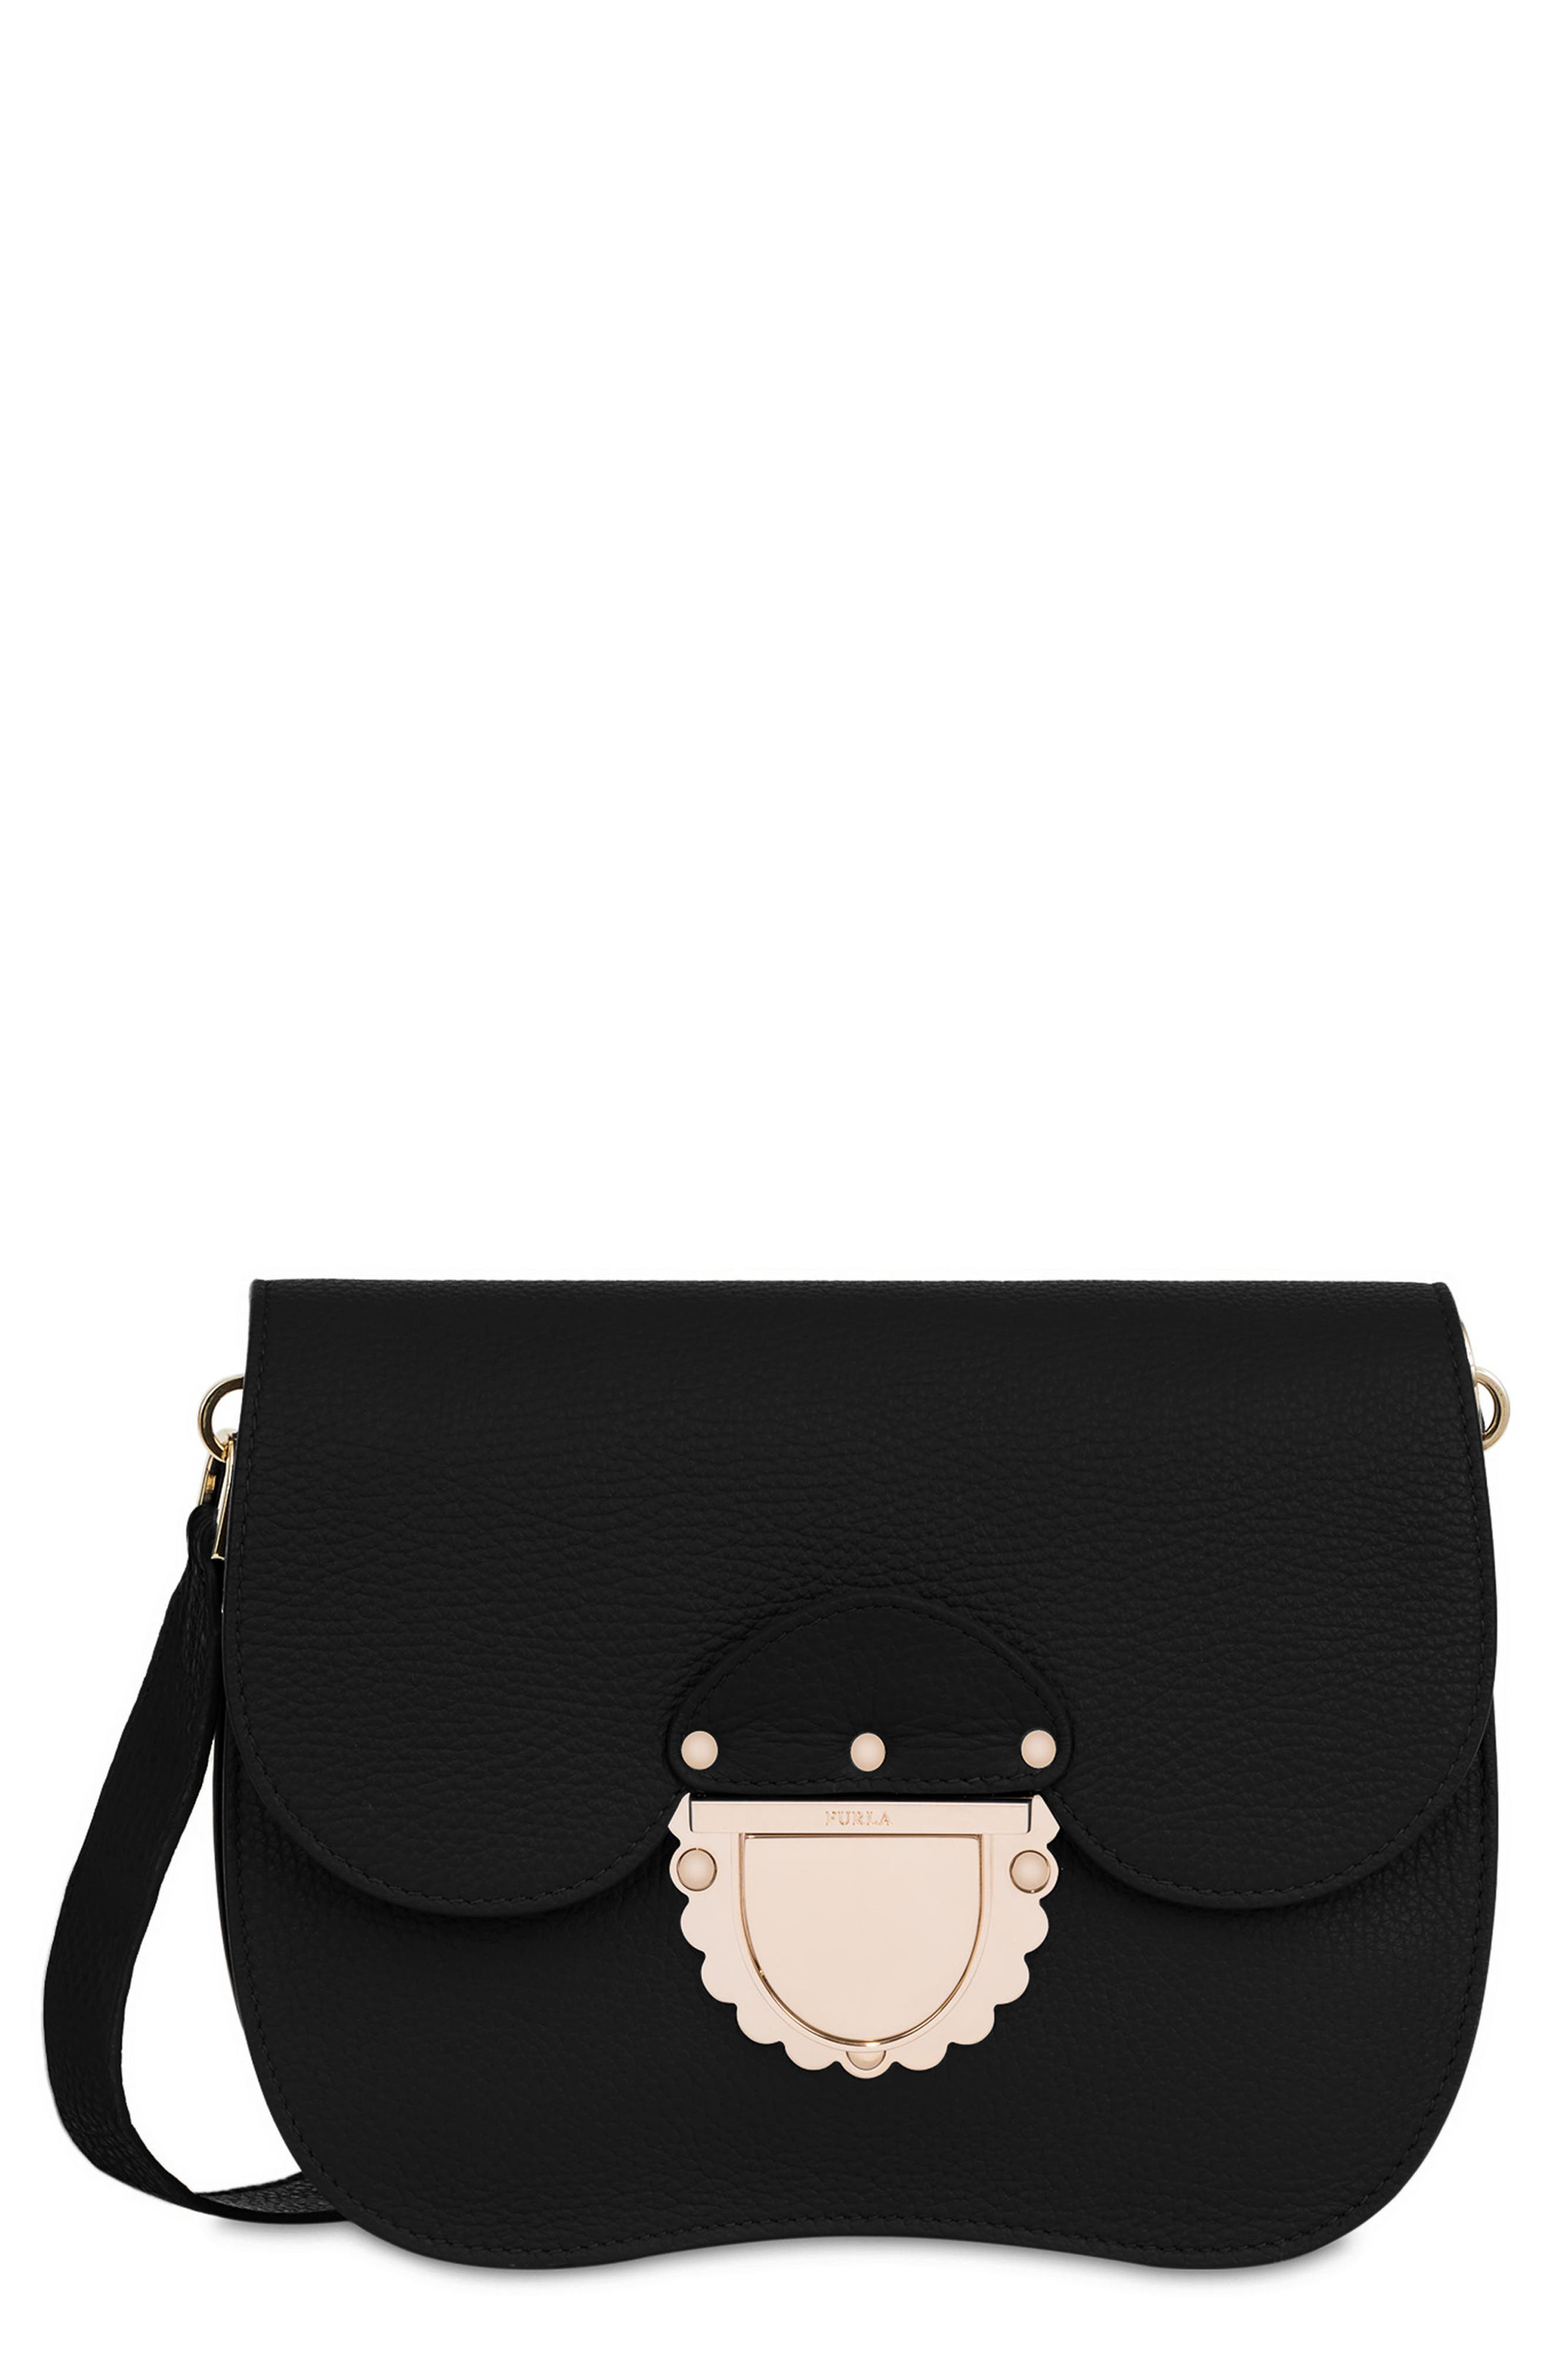 FURLA,                             Small Metropolis Leather Crossbody Bag,                             Main thumbnail 1, color,                             001